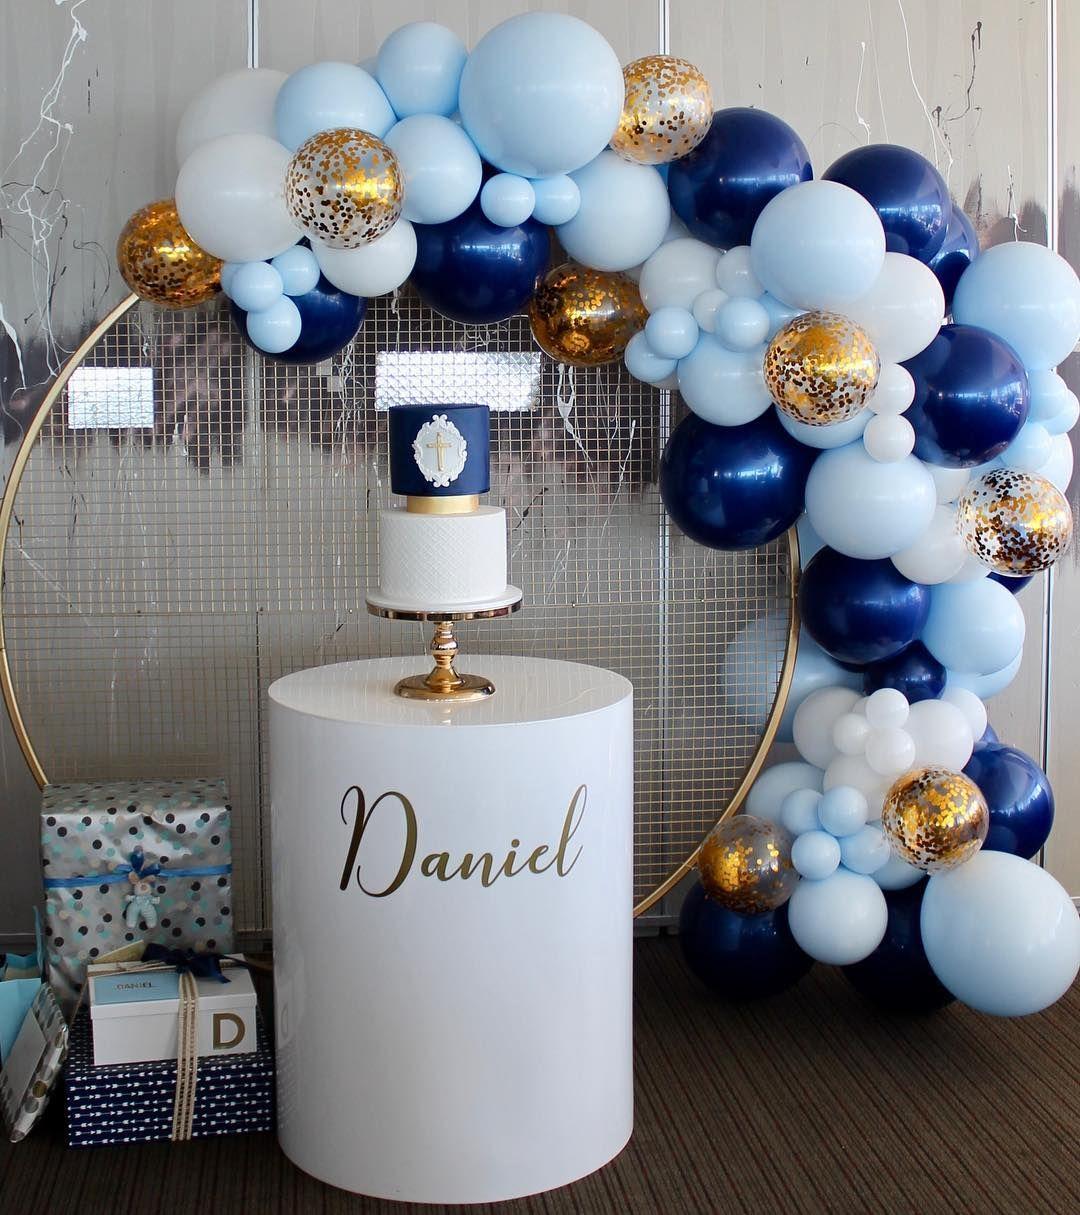 Daniels Christening Wall Plinth Arabellaevents Balloons